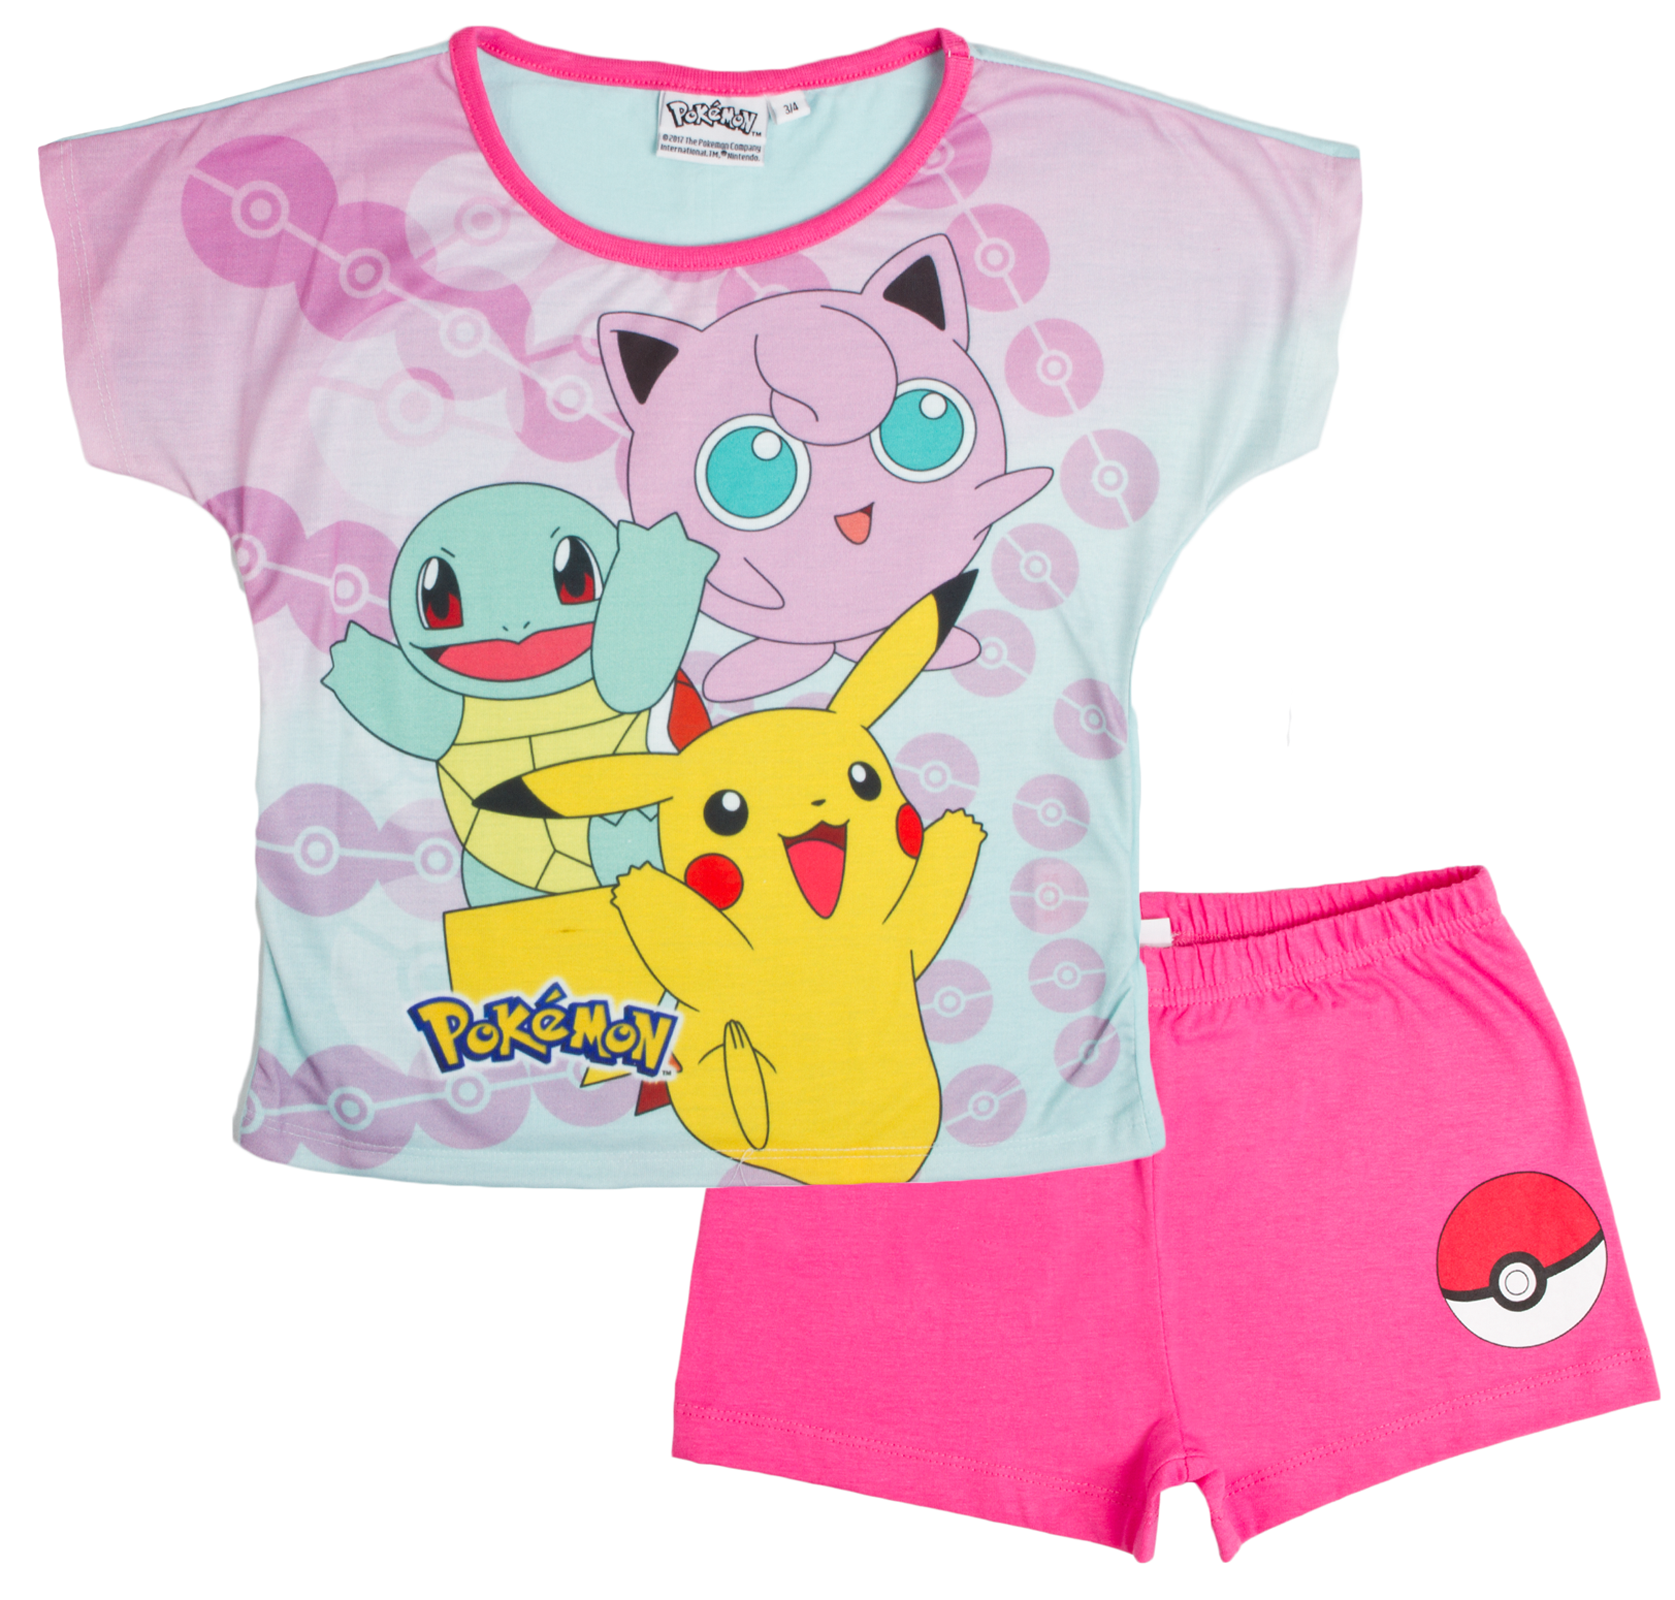 Boys Girls Pokemon Short Pyjamas Short Sleeve Shortie PJs Set